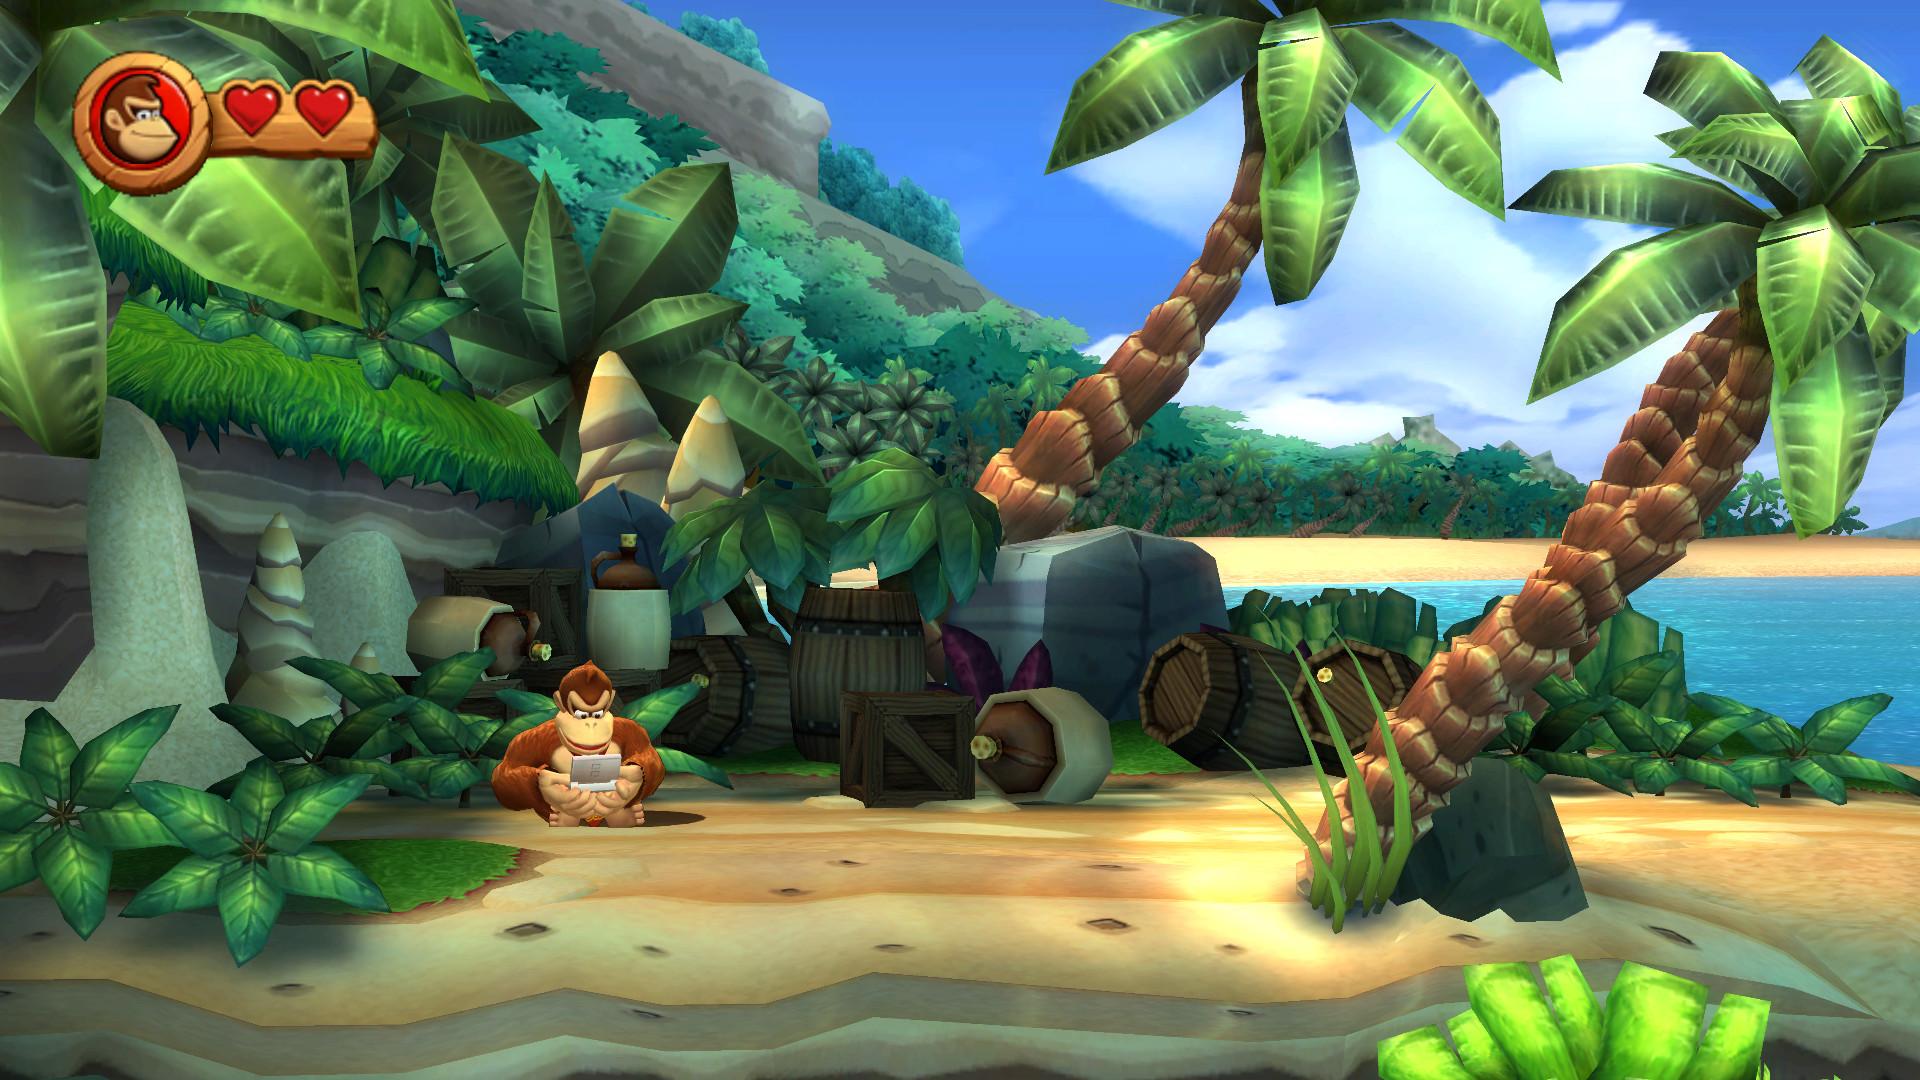 Nintendo Download Donkey Kong Country Returns Wii U